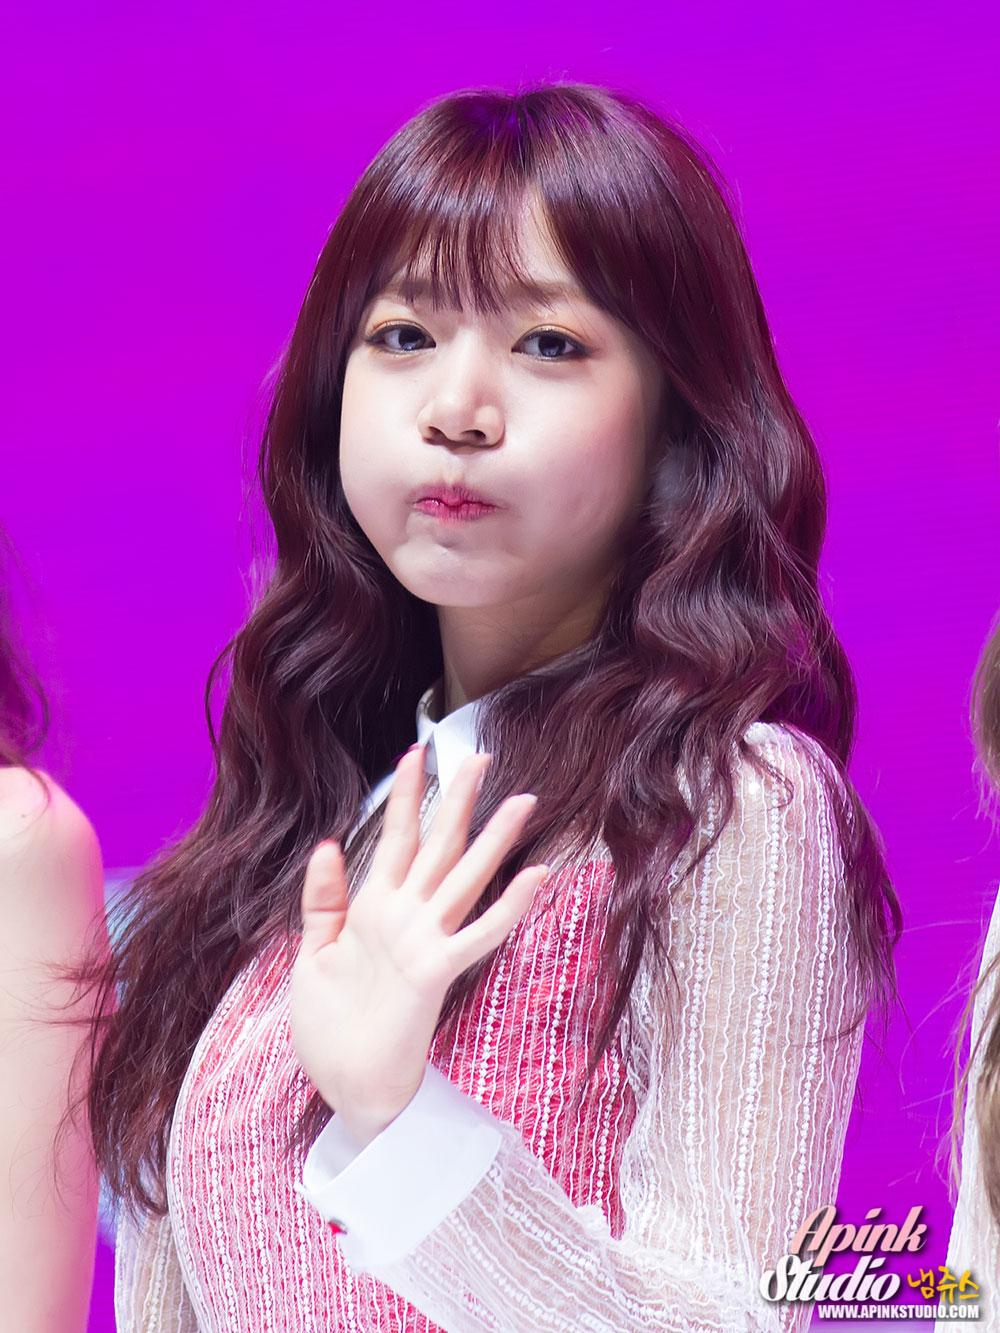 Apink Namjoo SBS Awards Festival 2015